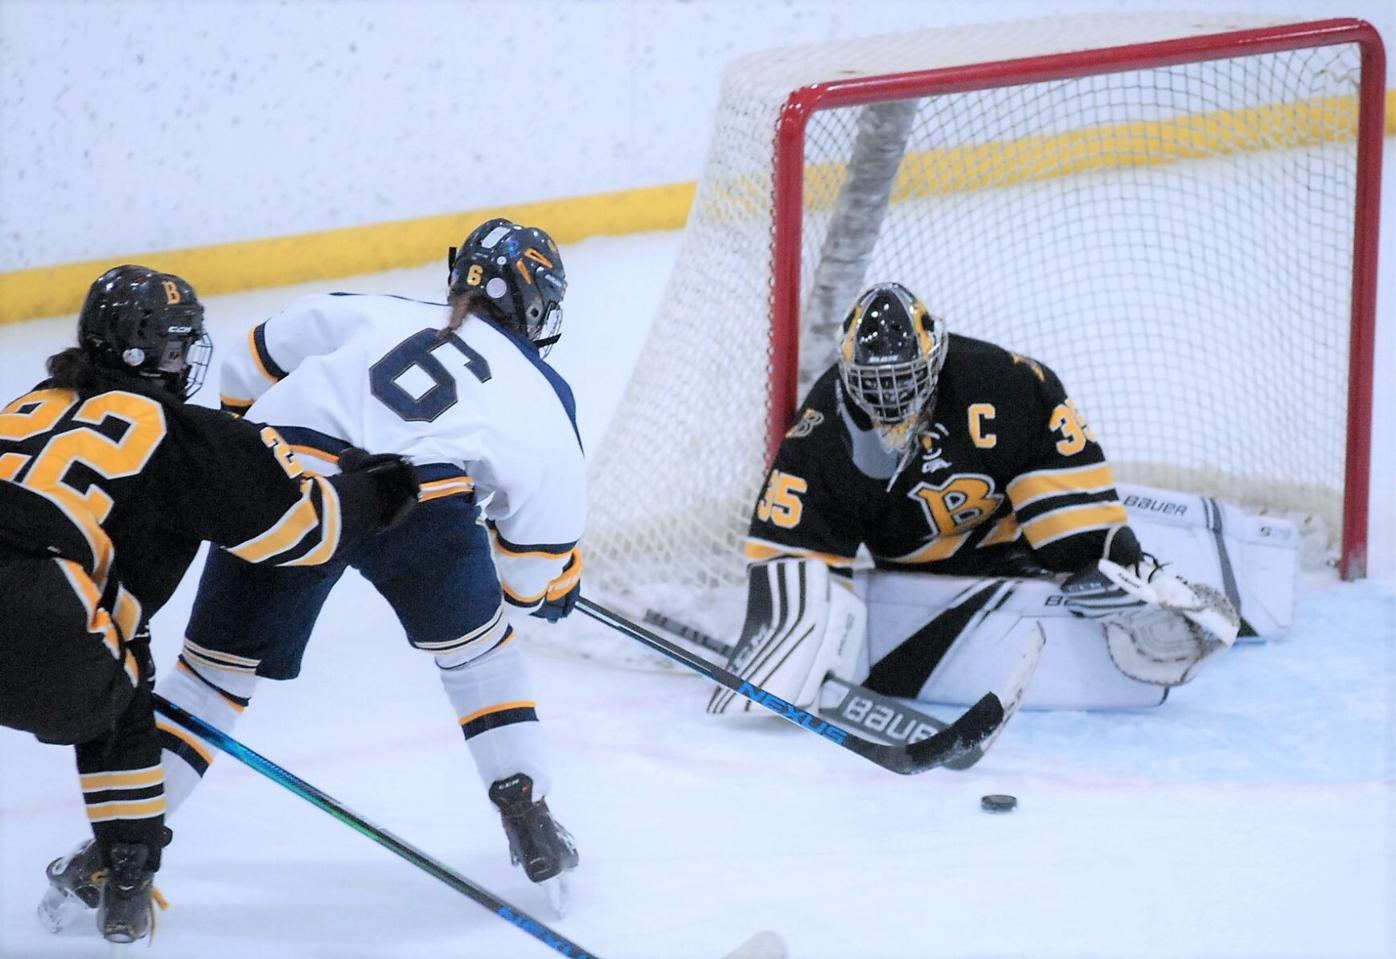 SSC girls hockey: Fun is just beginning for Blaze girls skaters